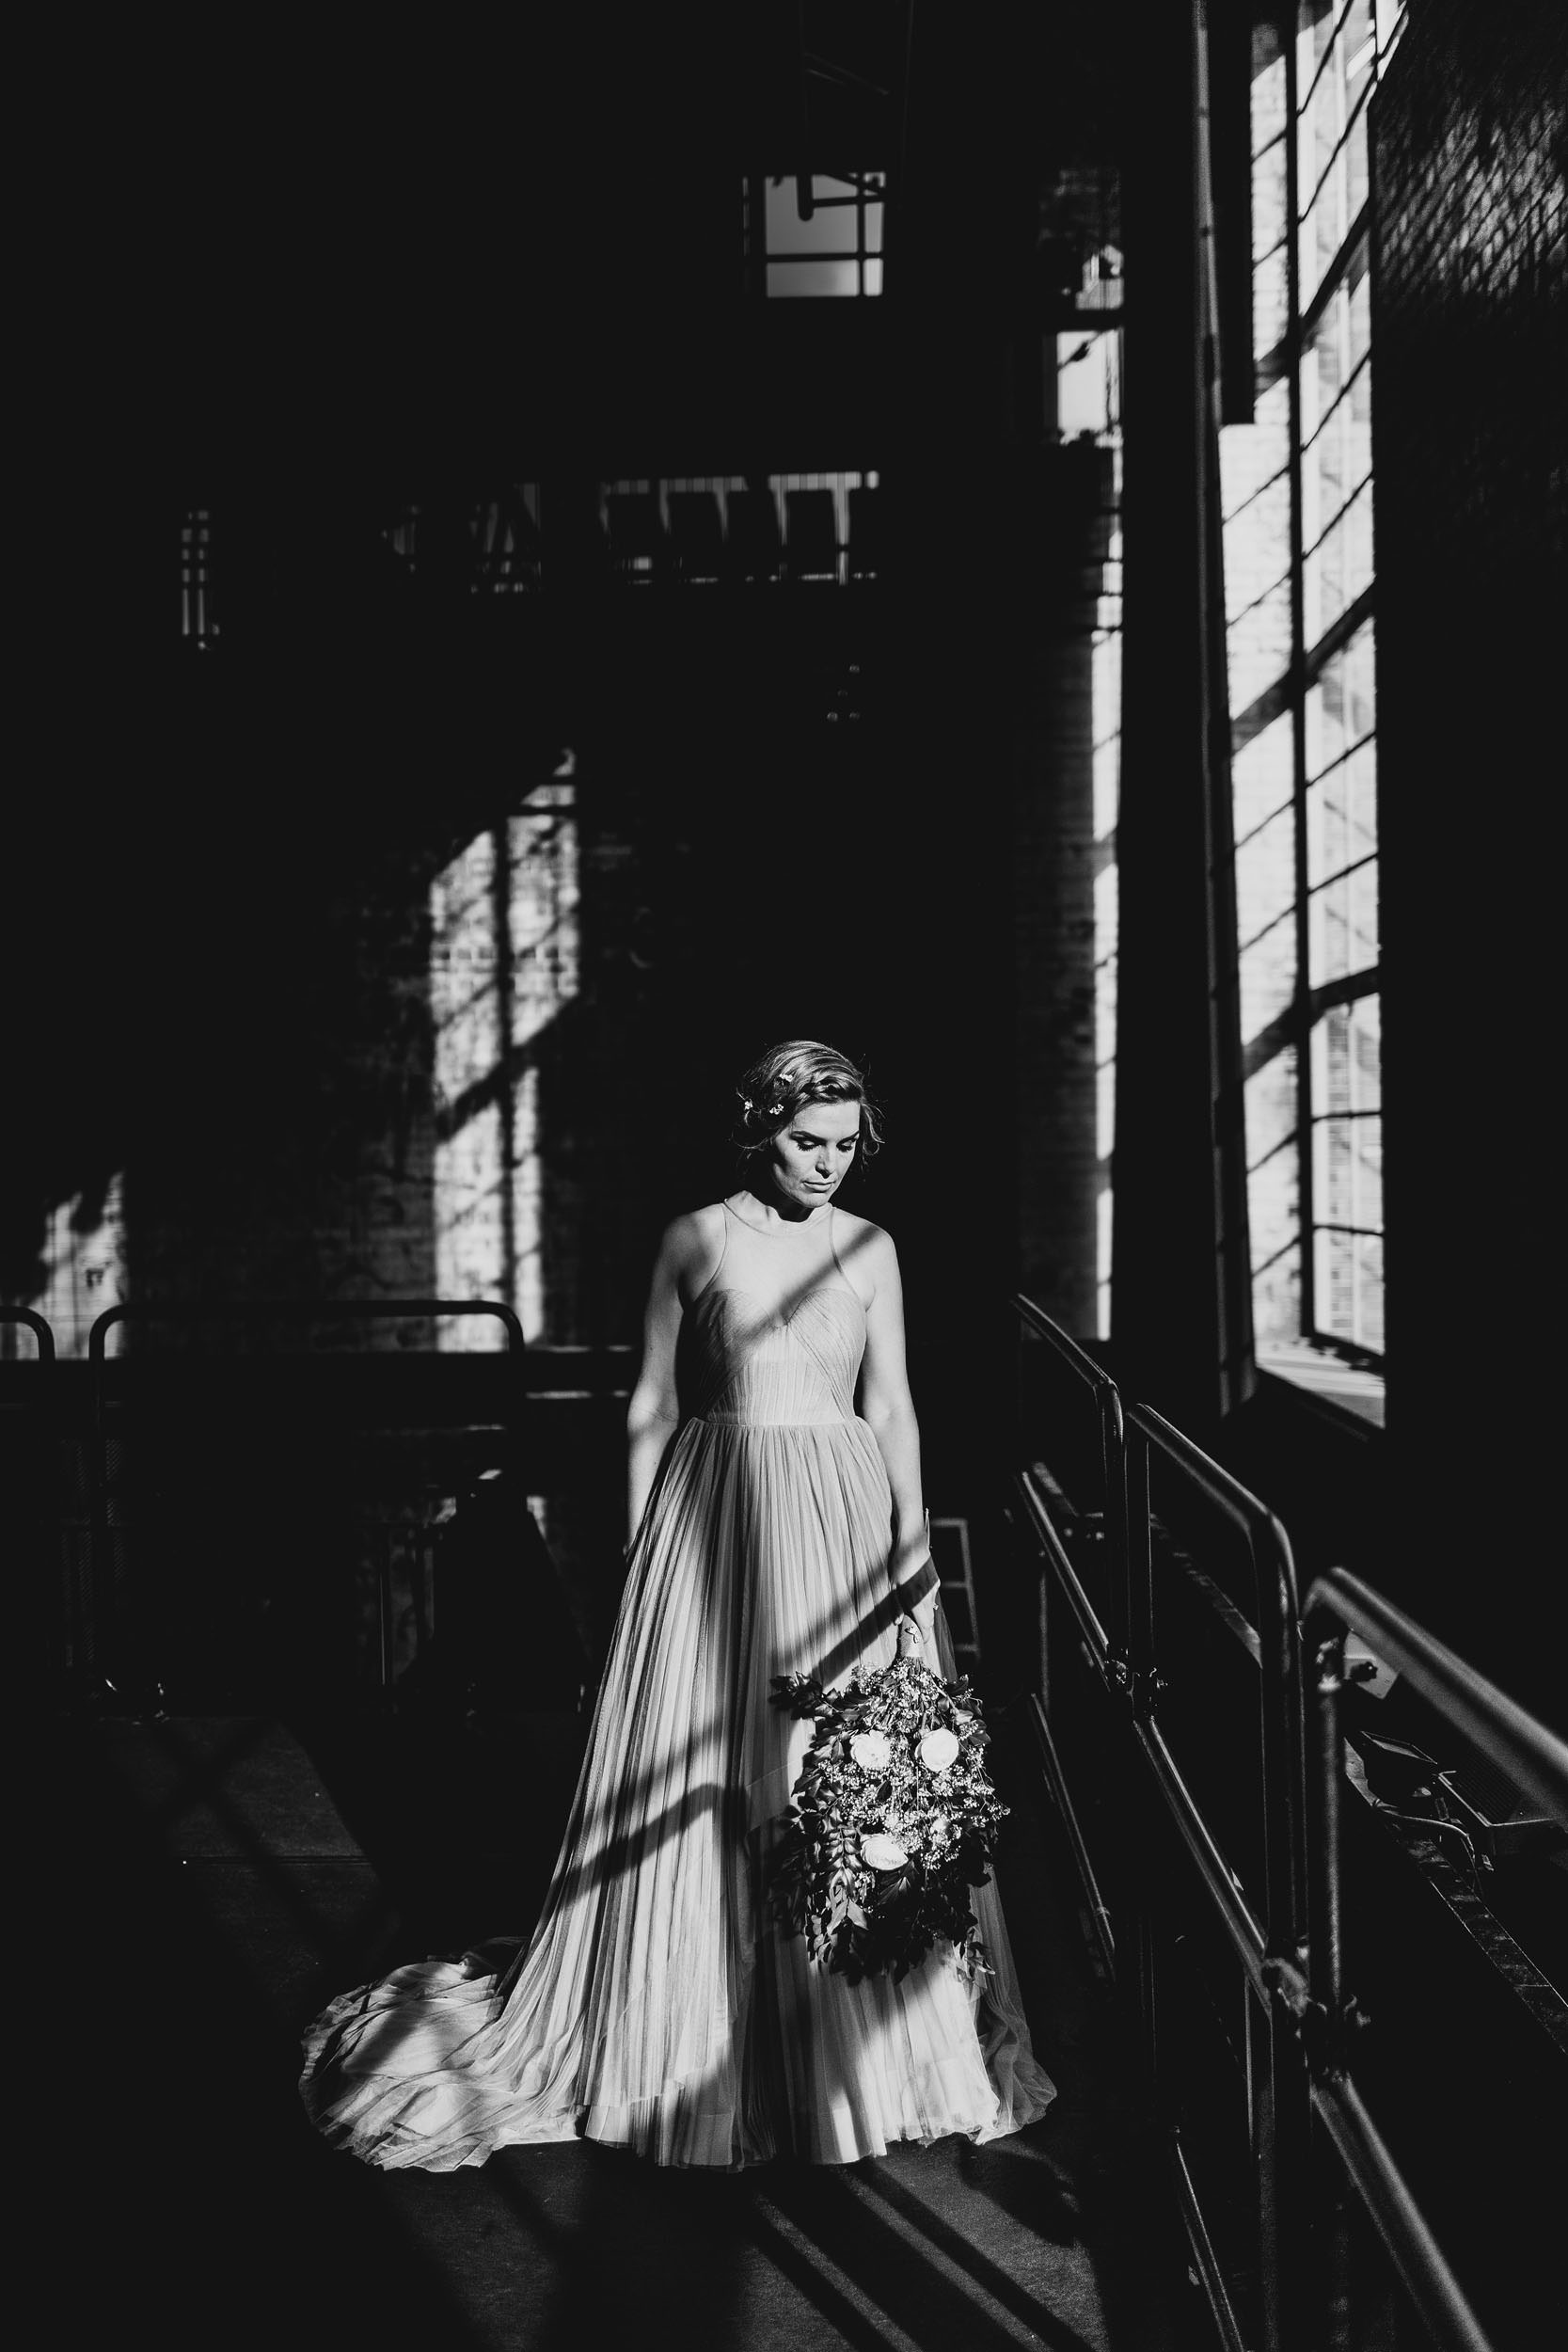 053_power_house_wedding_finch_and_oak.jpg